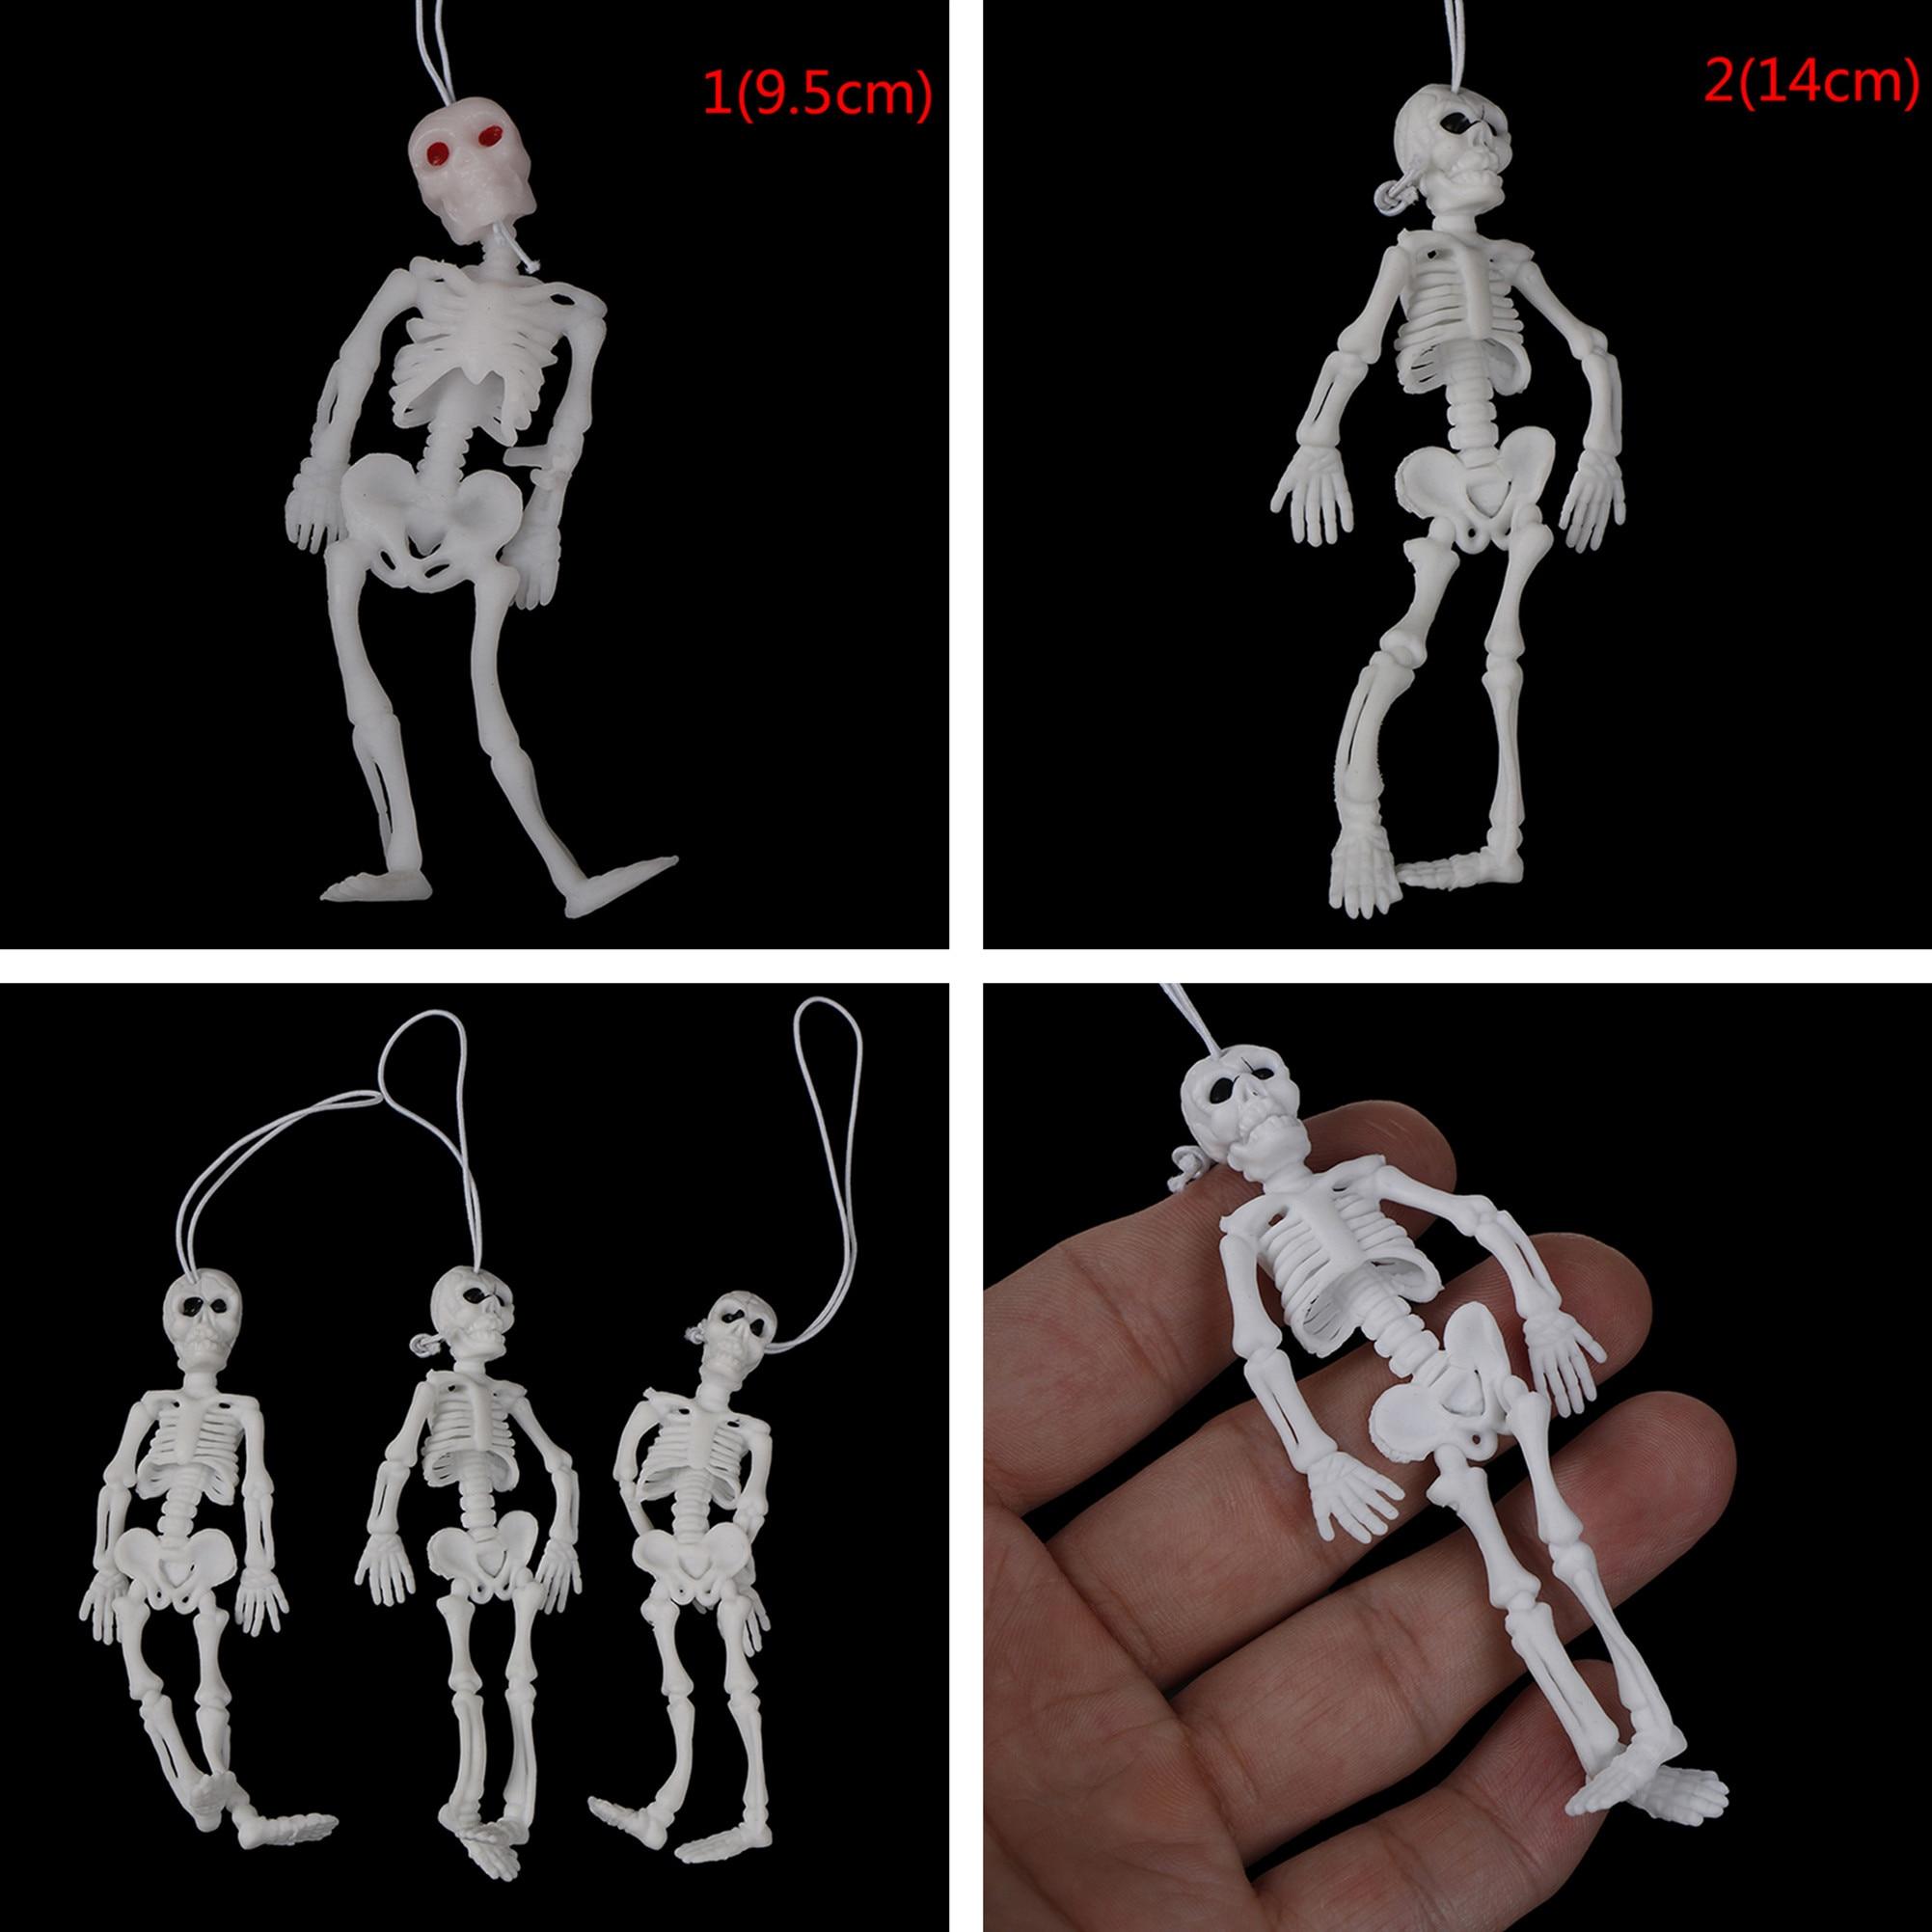 2pcs Fashion Jewelry Men Women Boys Girls Keychains Toilet Skull Skeleton On Commode Rubber Keyring Charms Car Keyfob